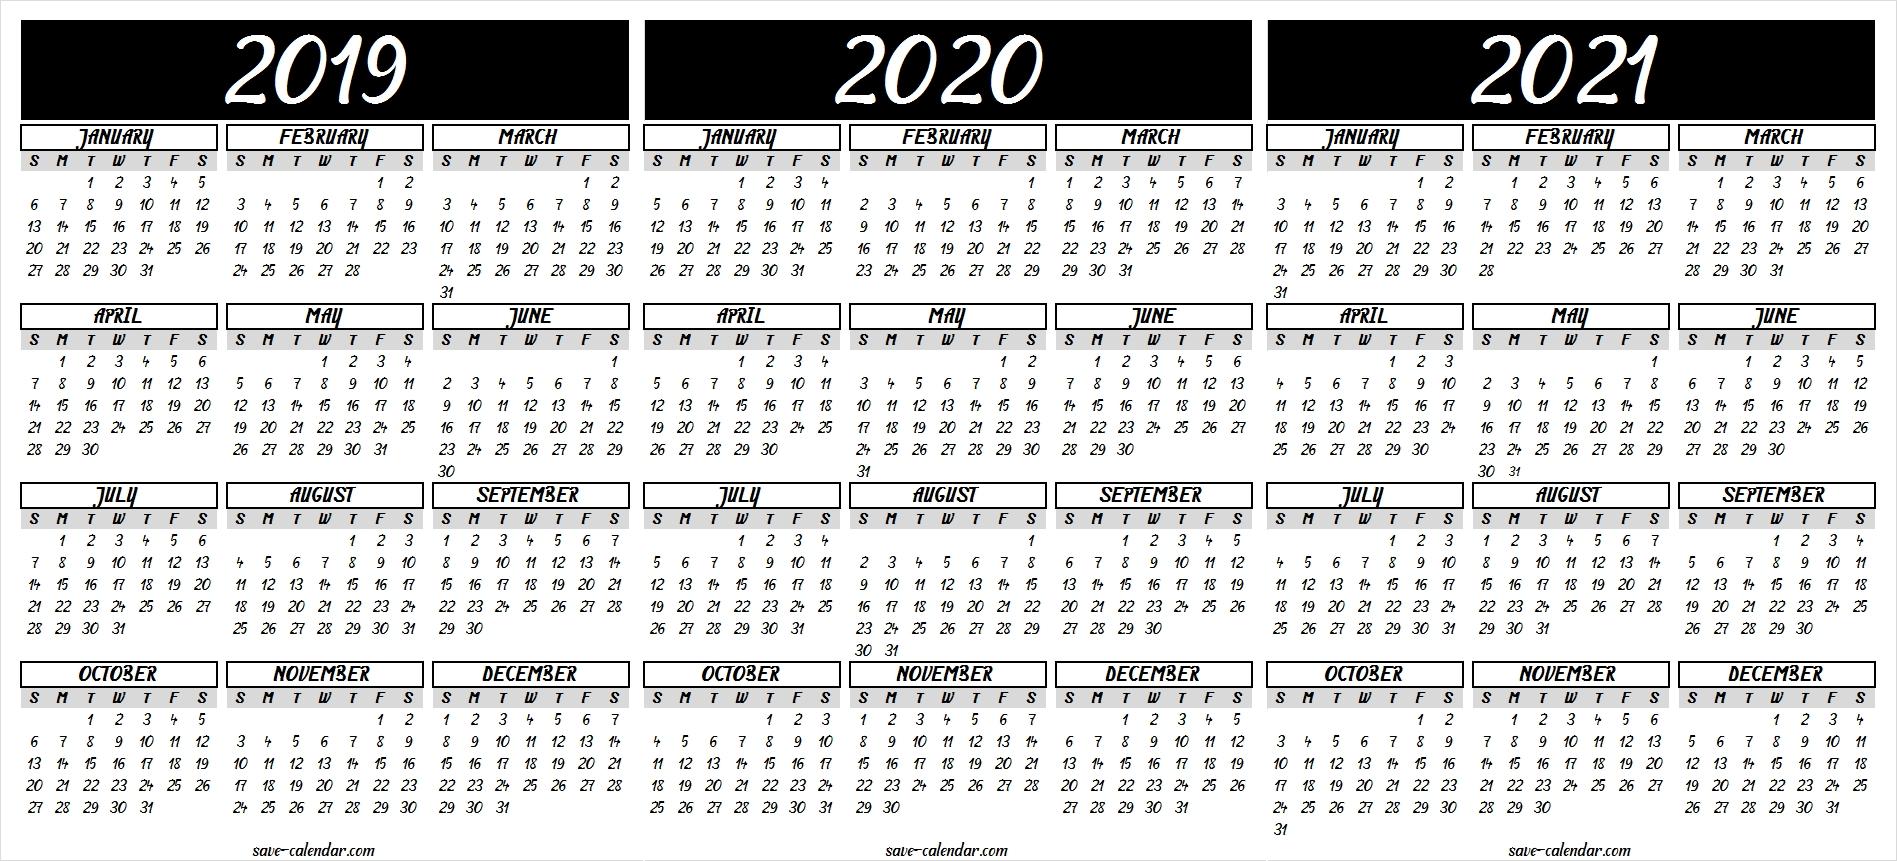 2019 2020 2021 Calendar Printable | 2018 Calendar | 2021 Calendar for 2019 2020 2021 Printable Calendar Free